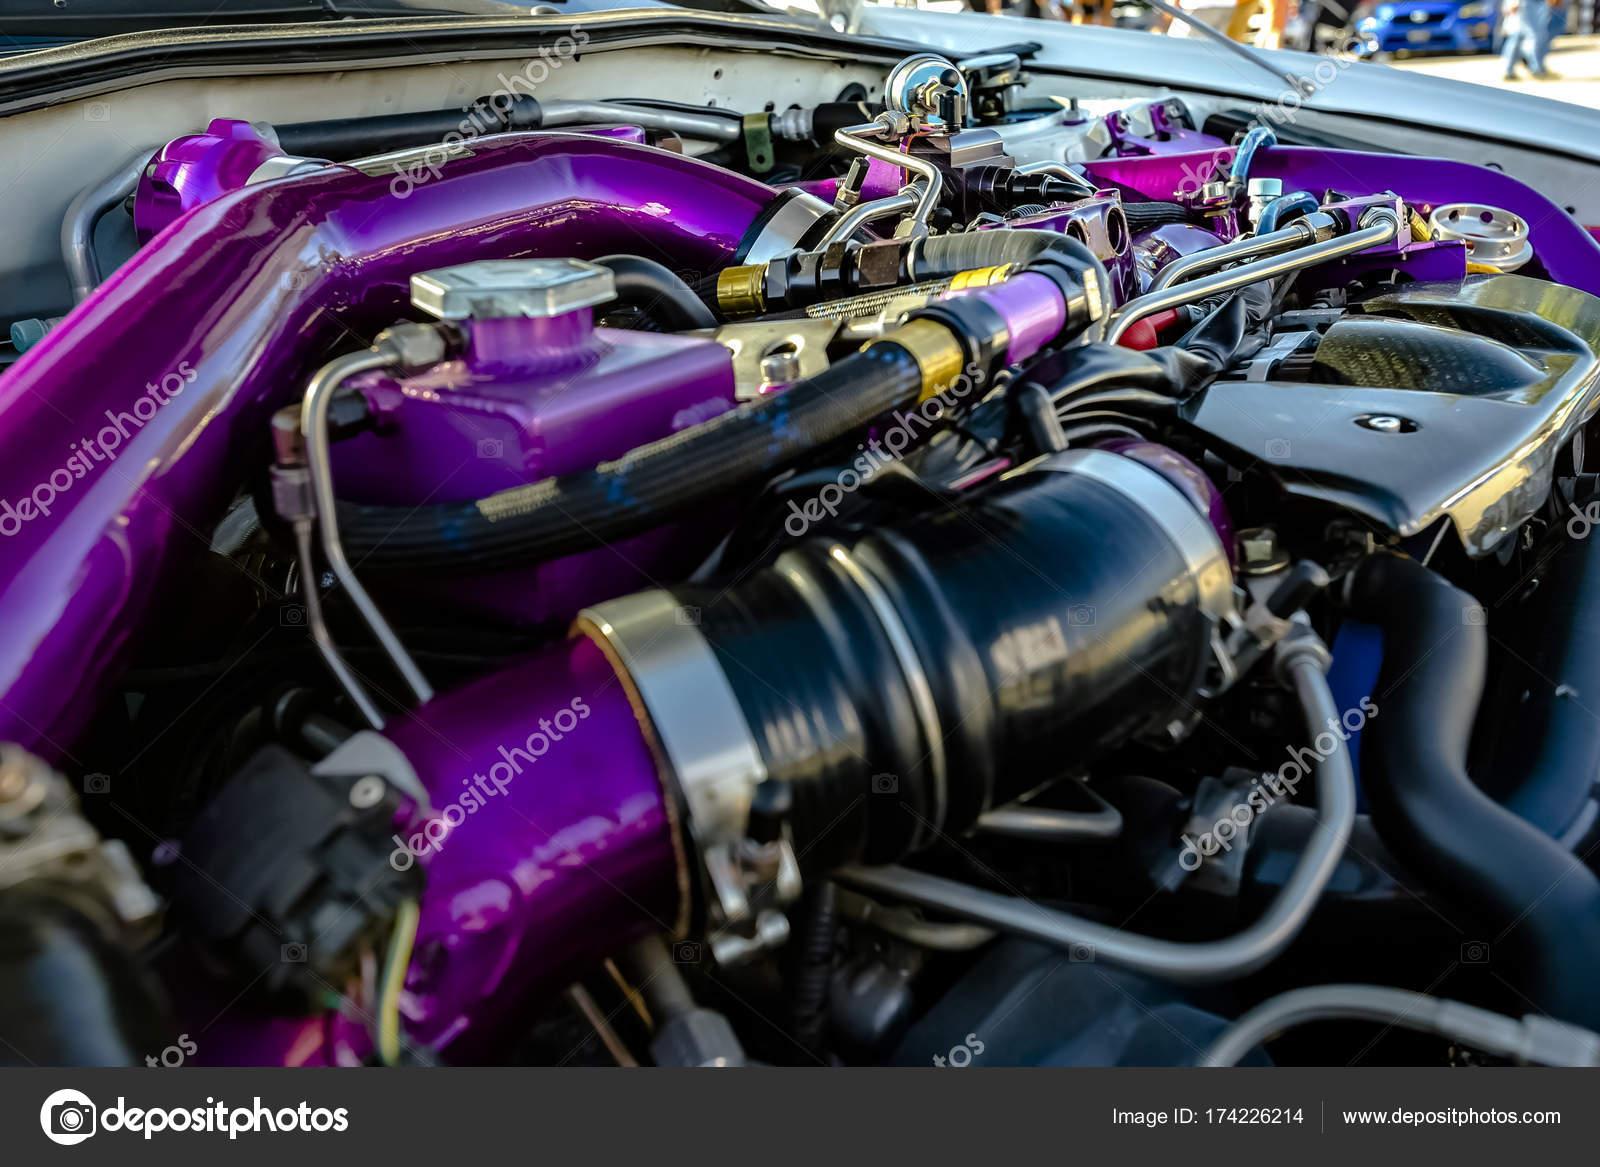 Lila Rohre in einem modernen Auto — Stockfoto © dropthepress@gmail ...